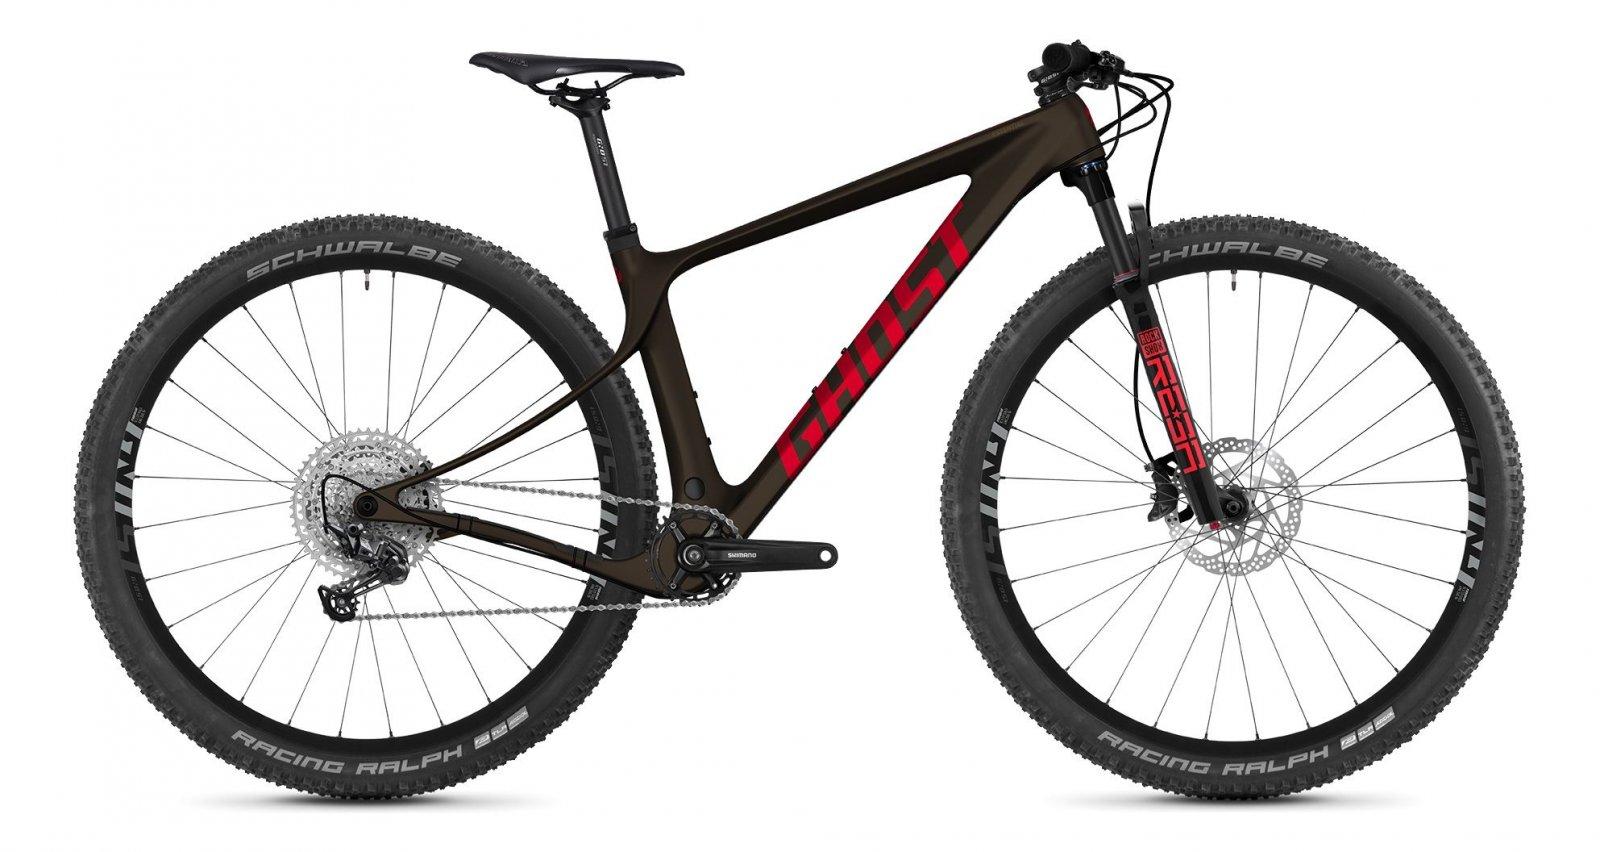 Ghost-lector_sf_lc_essential-_mountain_bike-2021-02.jpg